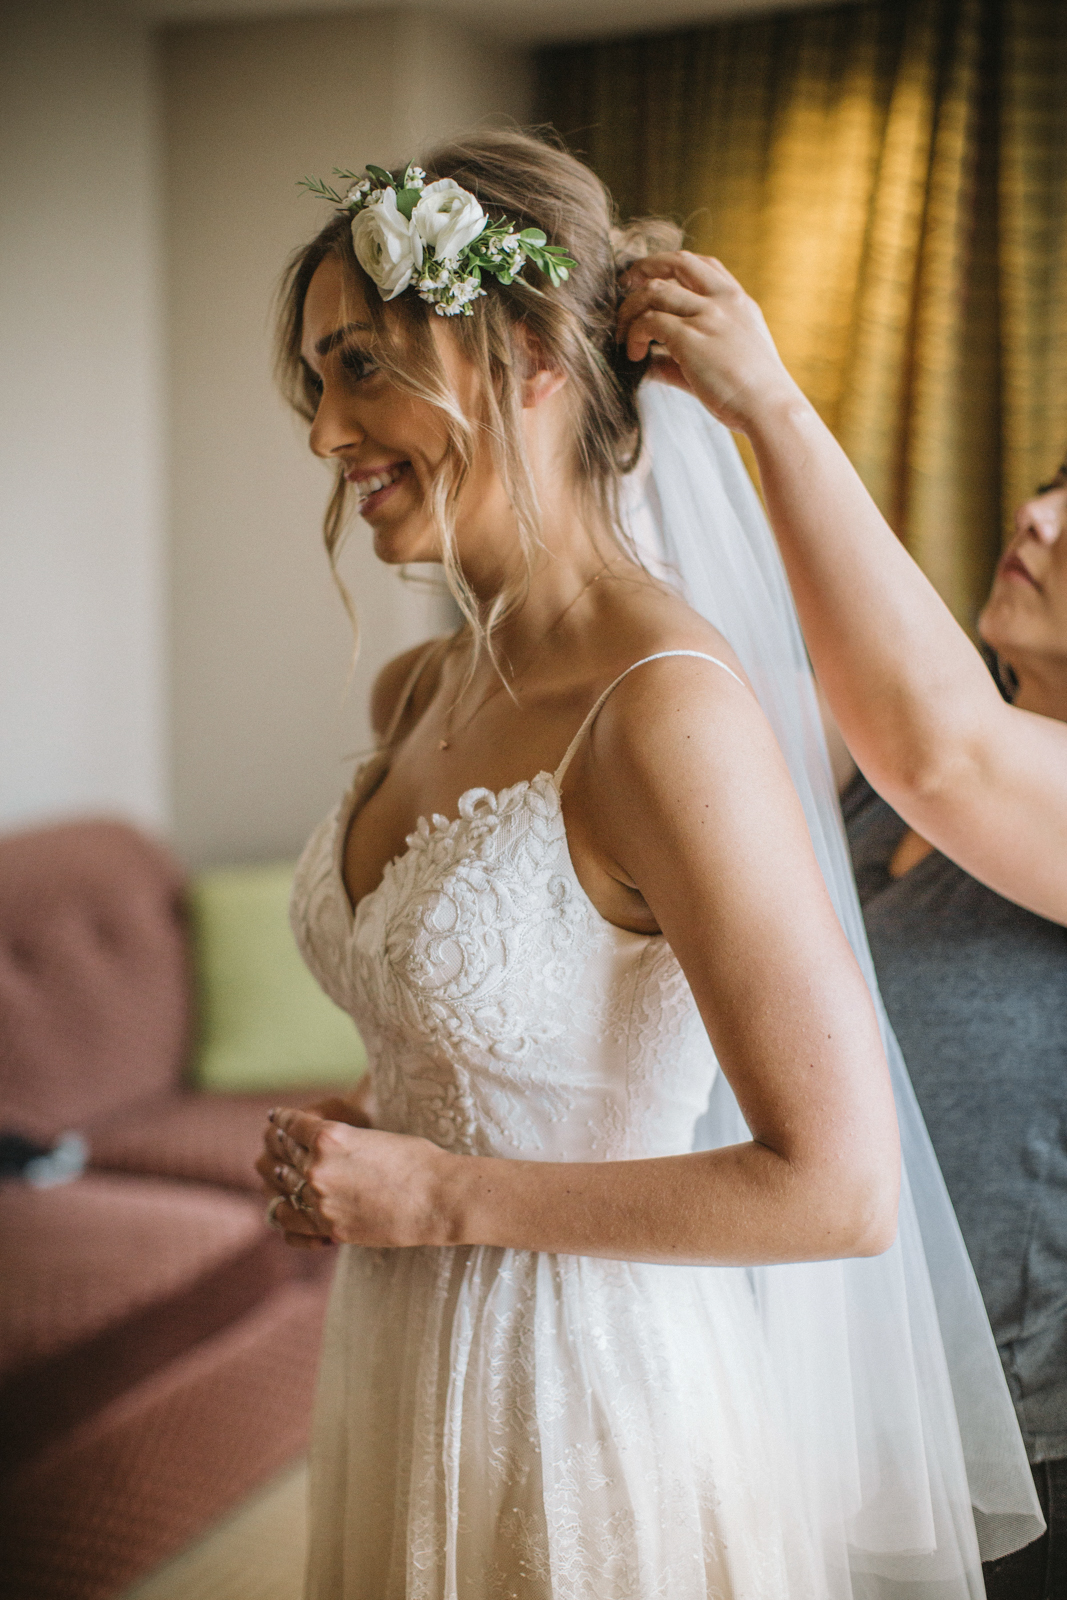 BeanandCole.com-Chris&JackieJohnson-Wedding-1020.jpg